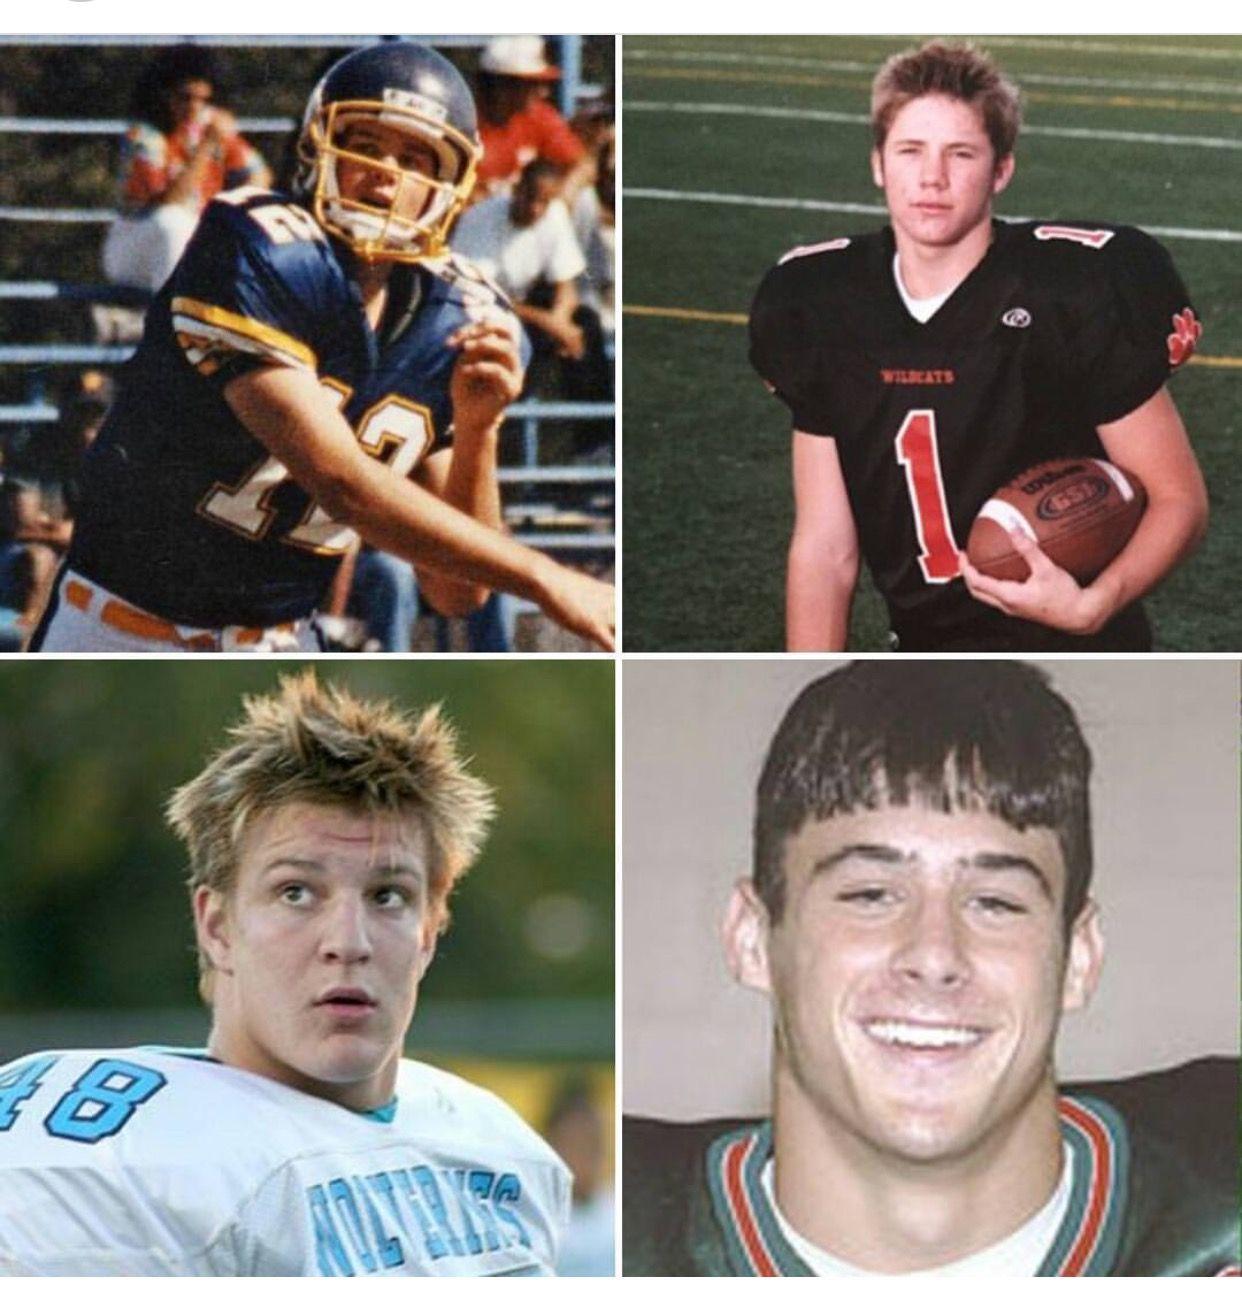 Throwback to HS years. Brady, Jillian, Gronk, & Danny